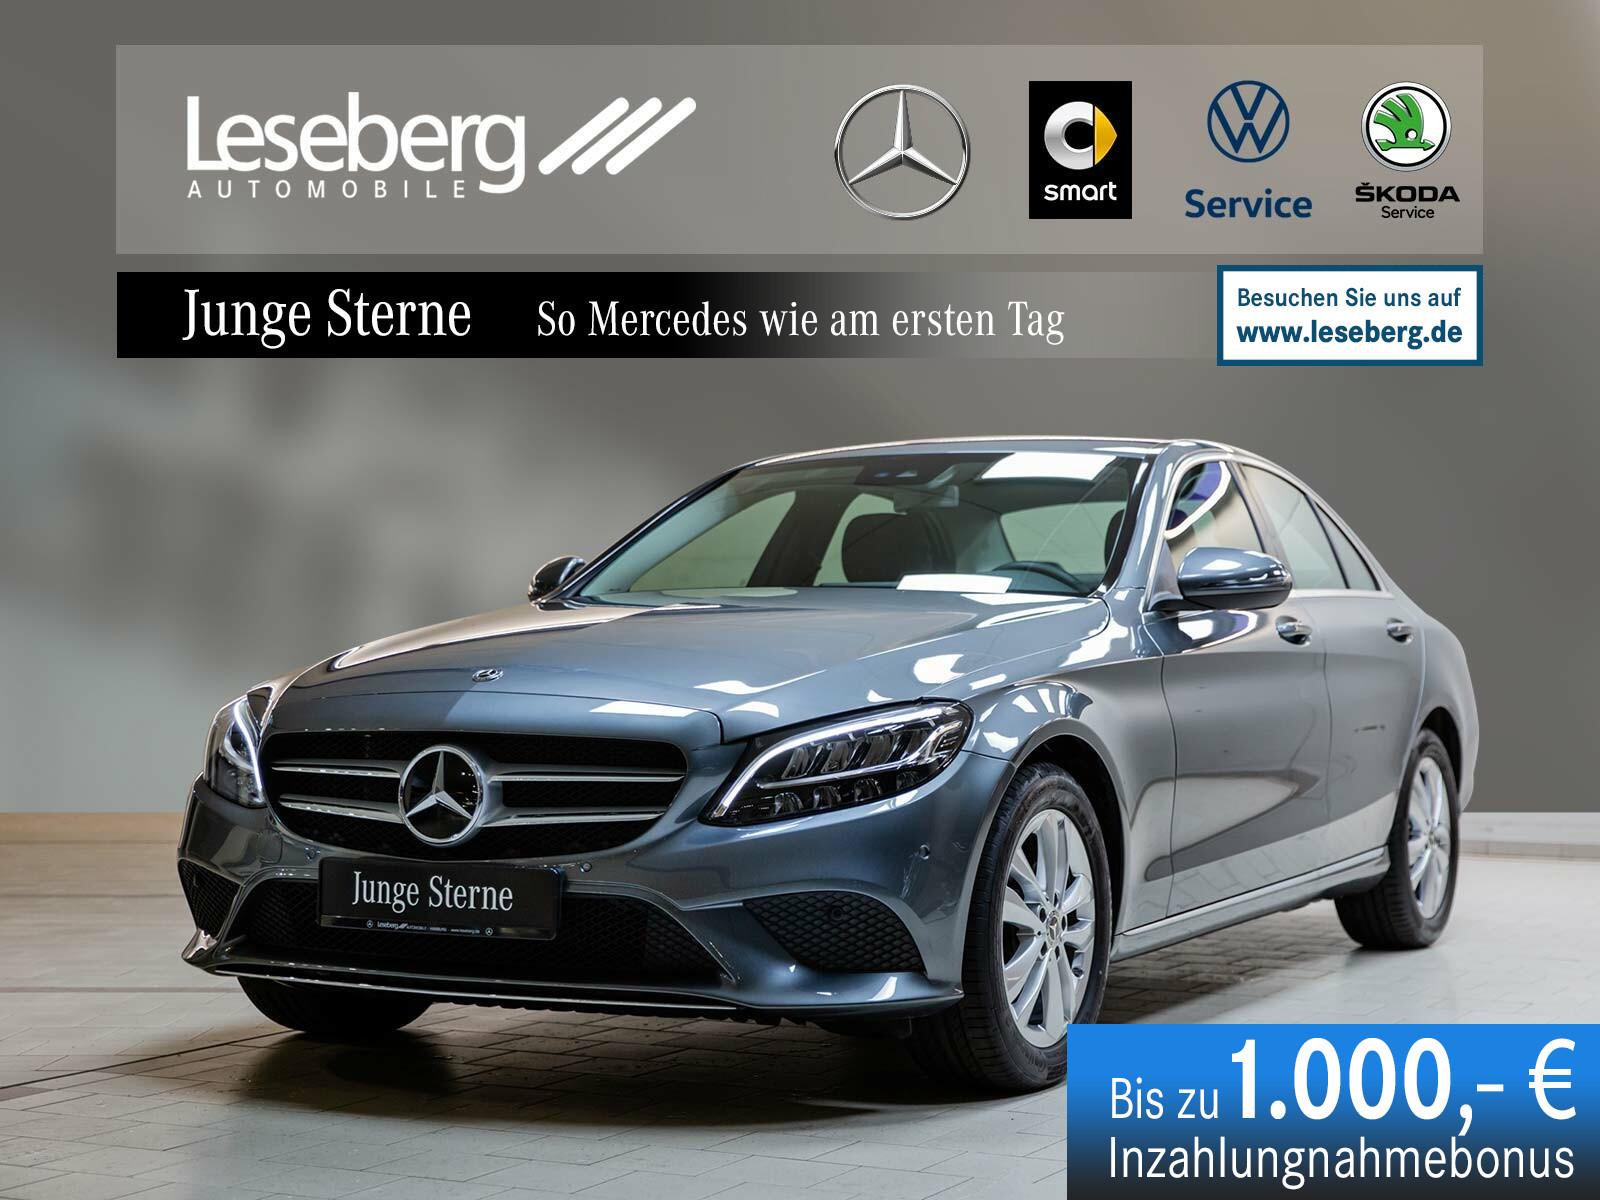 Mercedes-Benz C 180 Avantgarde/9G/AHK/LED/Kamera/Navi/Sitzheiz, Jahr 2019, Benzin